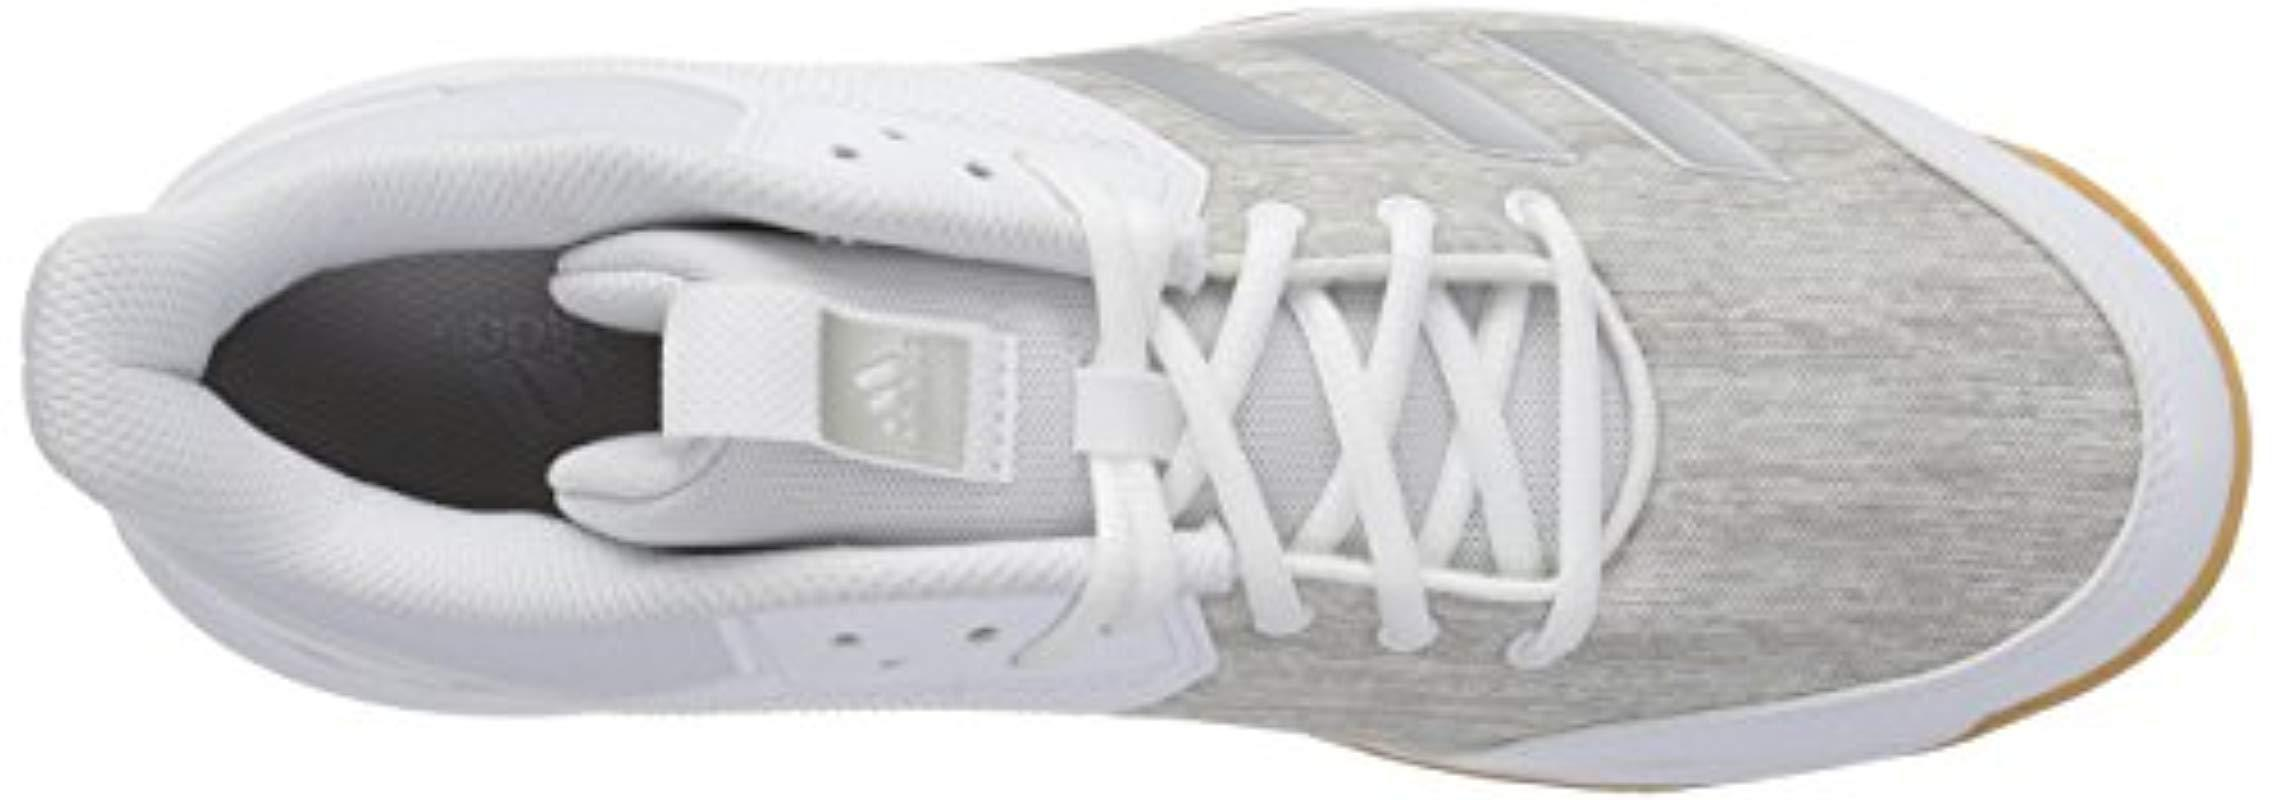 f593b9220ed Adidas Originals - Multicolor Ligra 6 Volleyball Shoe - Lyst. View  fullscreen